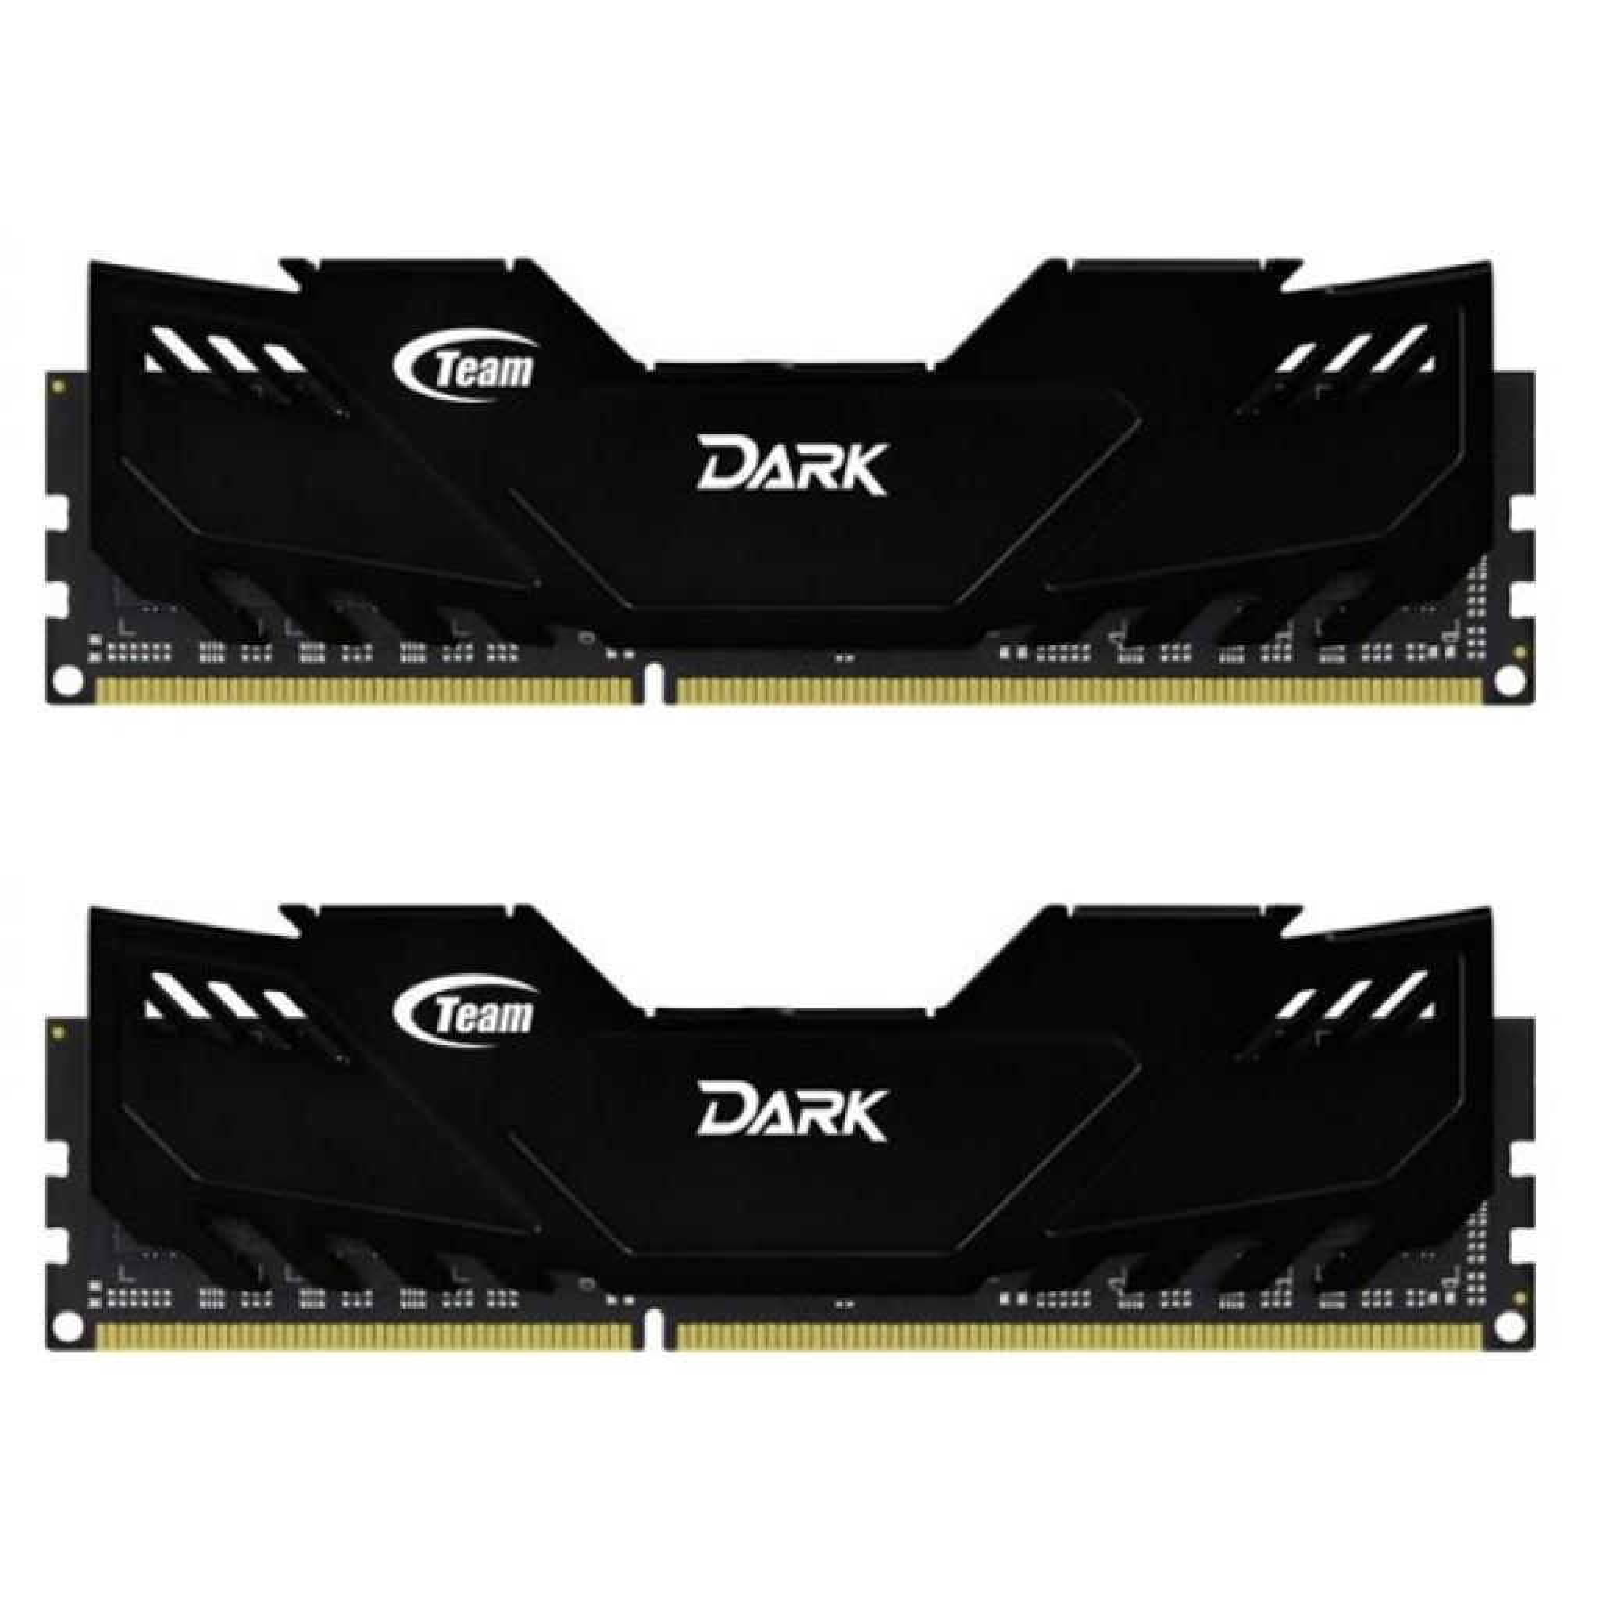 Модуль памяти для компьютера DDR4 16GB (2x8GB) 2800 MHz Dark Black Team (TDKED416G2800HC16ADC01)